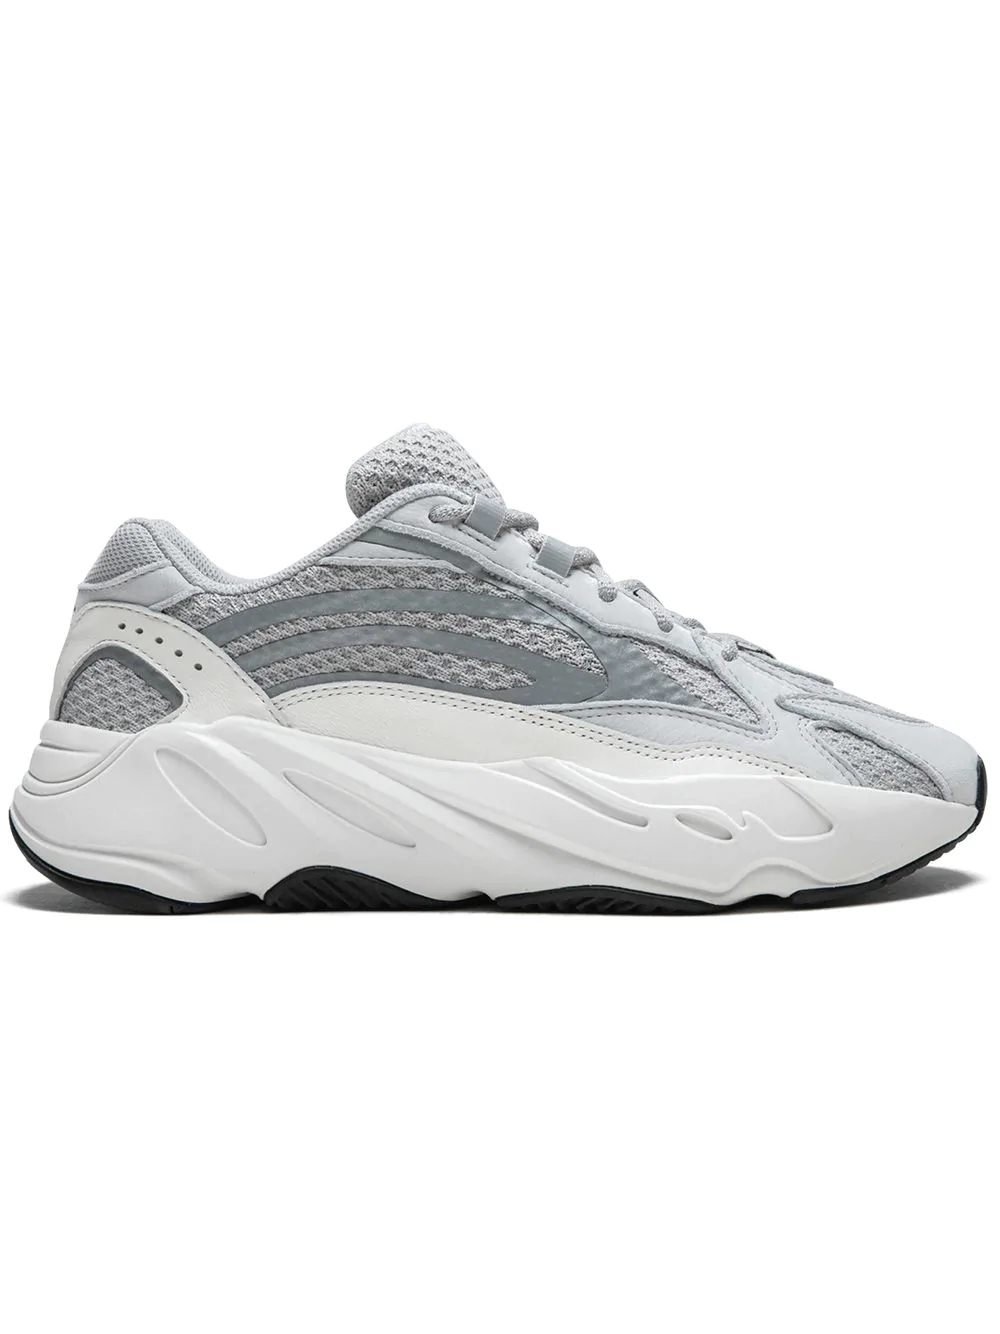 fdf6e27cf Select Size. Store Status Price. Adidas Originals Adidas Adidas X Yeezy  Boost 700 V2 Sneakers - Grey